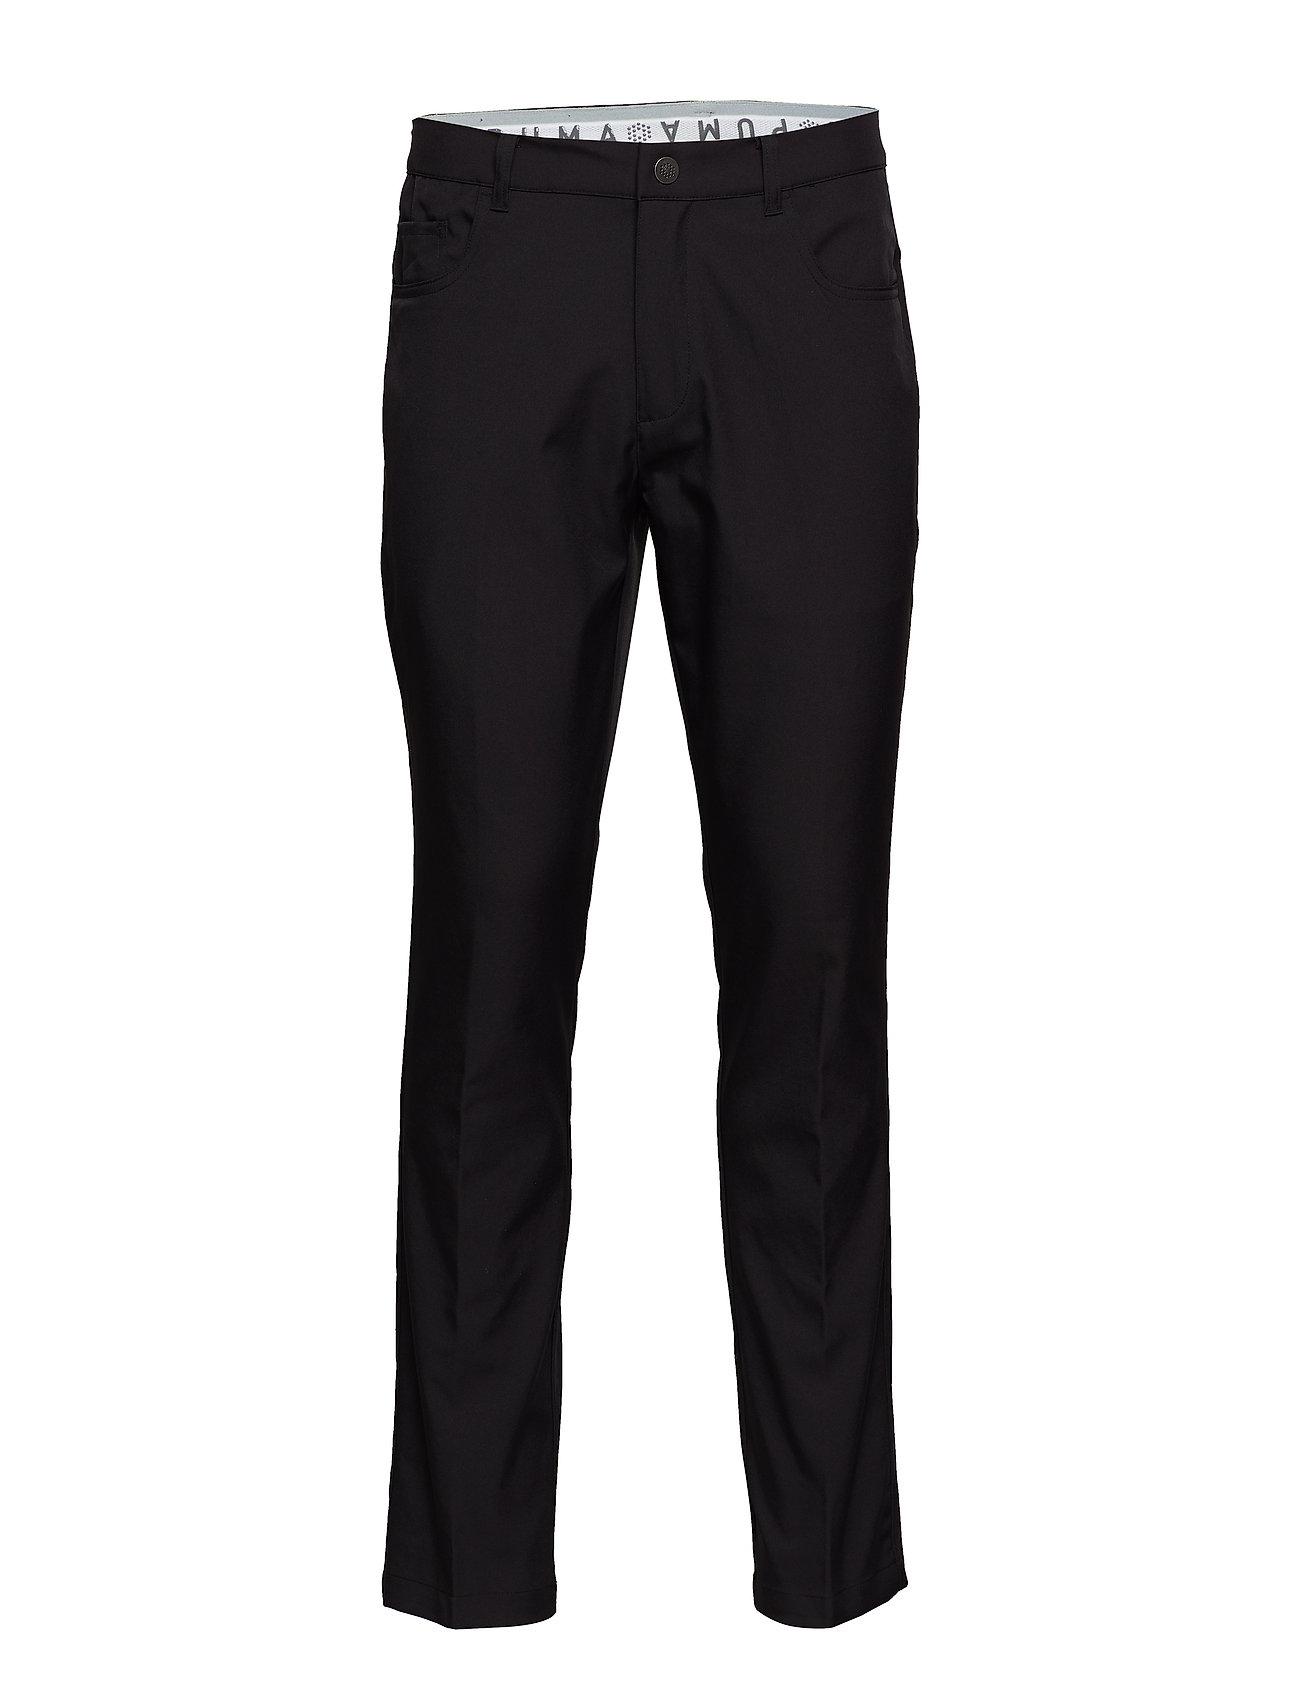 Image of Jackpot 5 Pocket Pant Sport Pants Sort PUMA Golf (3513565613)